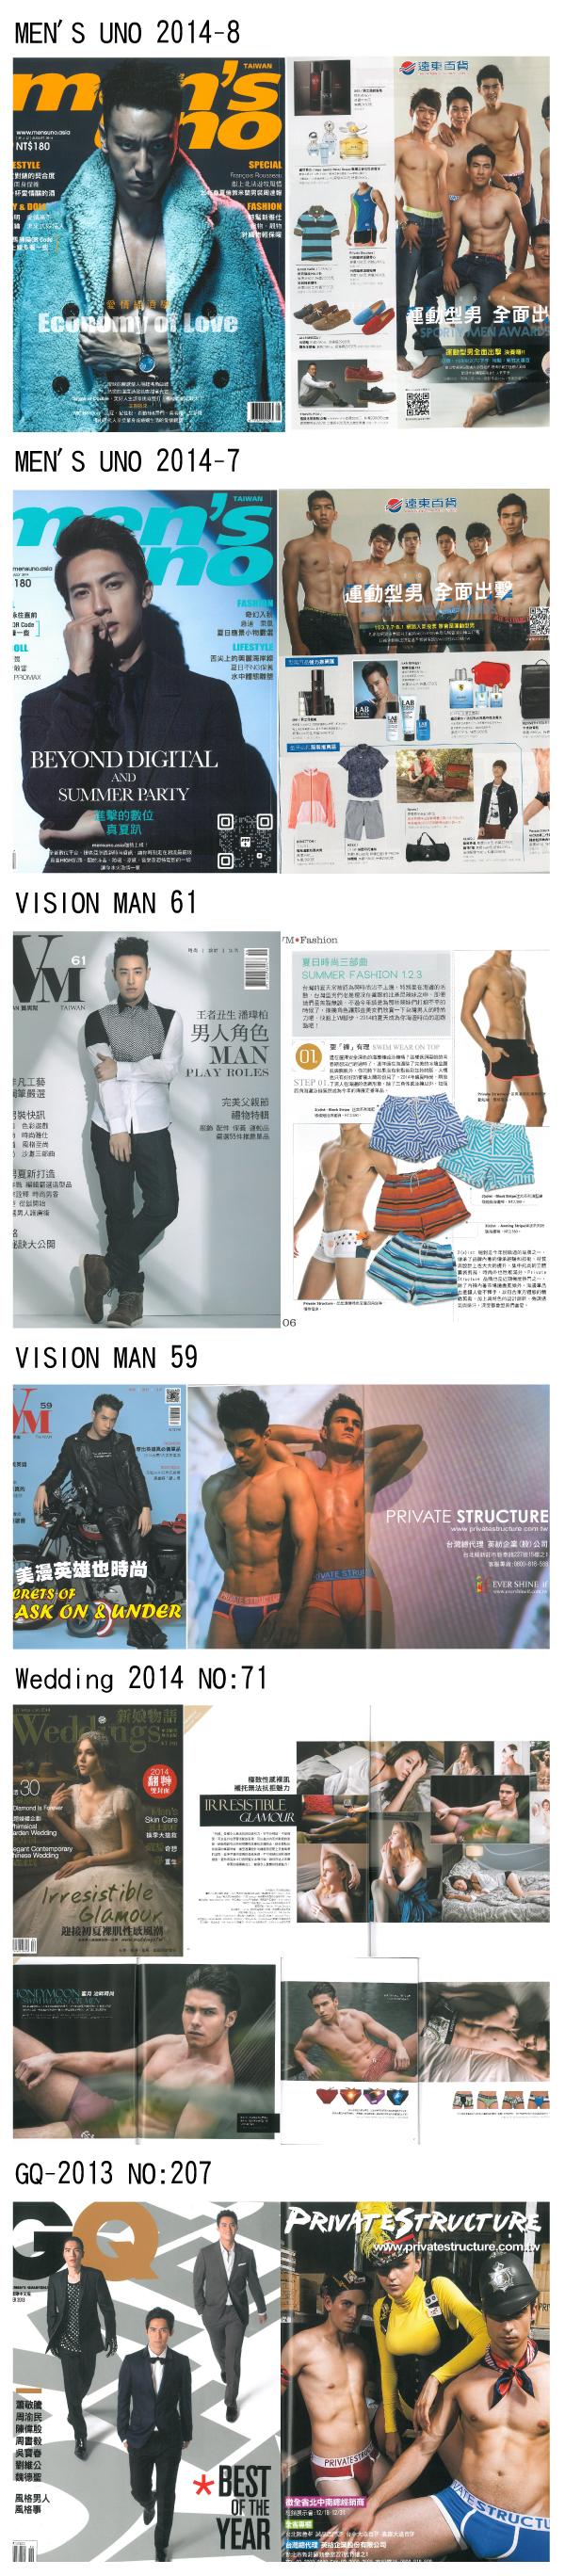 http://www.momoshop.com.tw/expertimg/0003/731/623/ps-magazine.jpg?t=1448562960